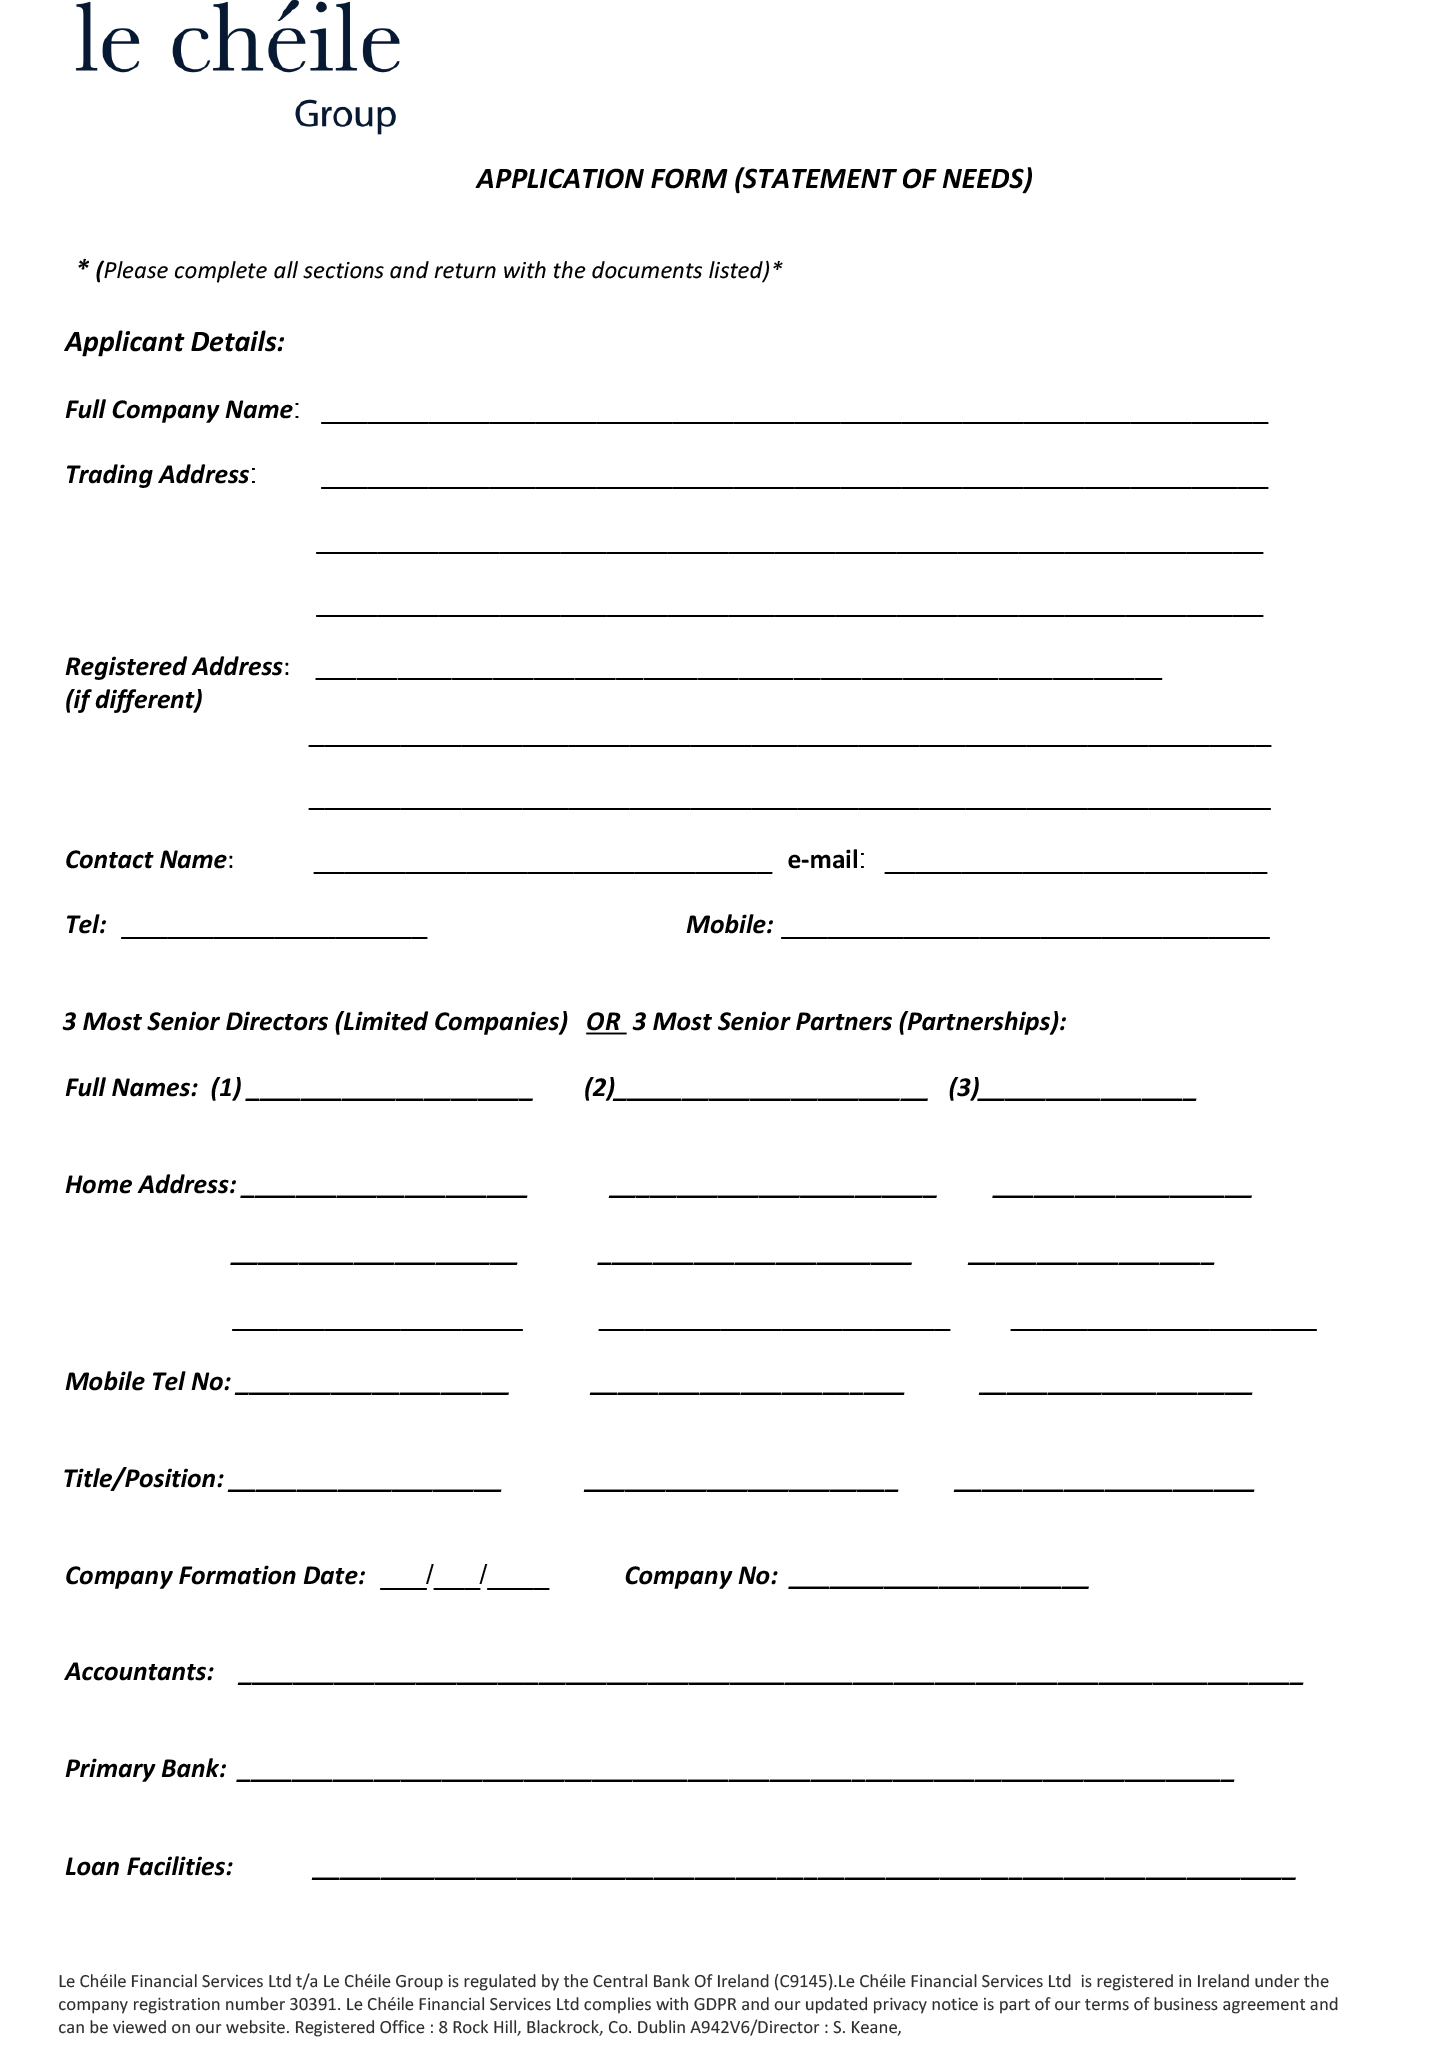 bond application thumbnail